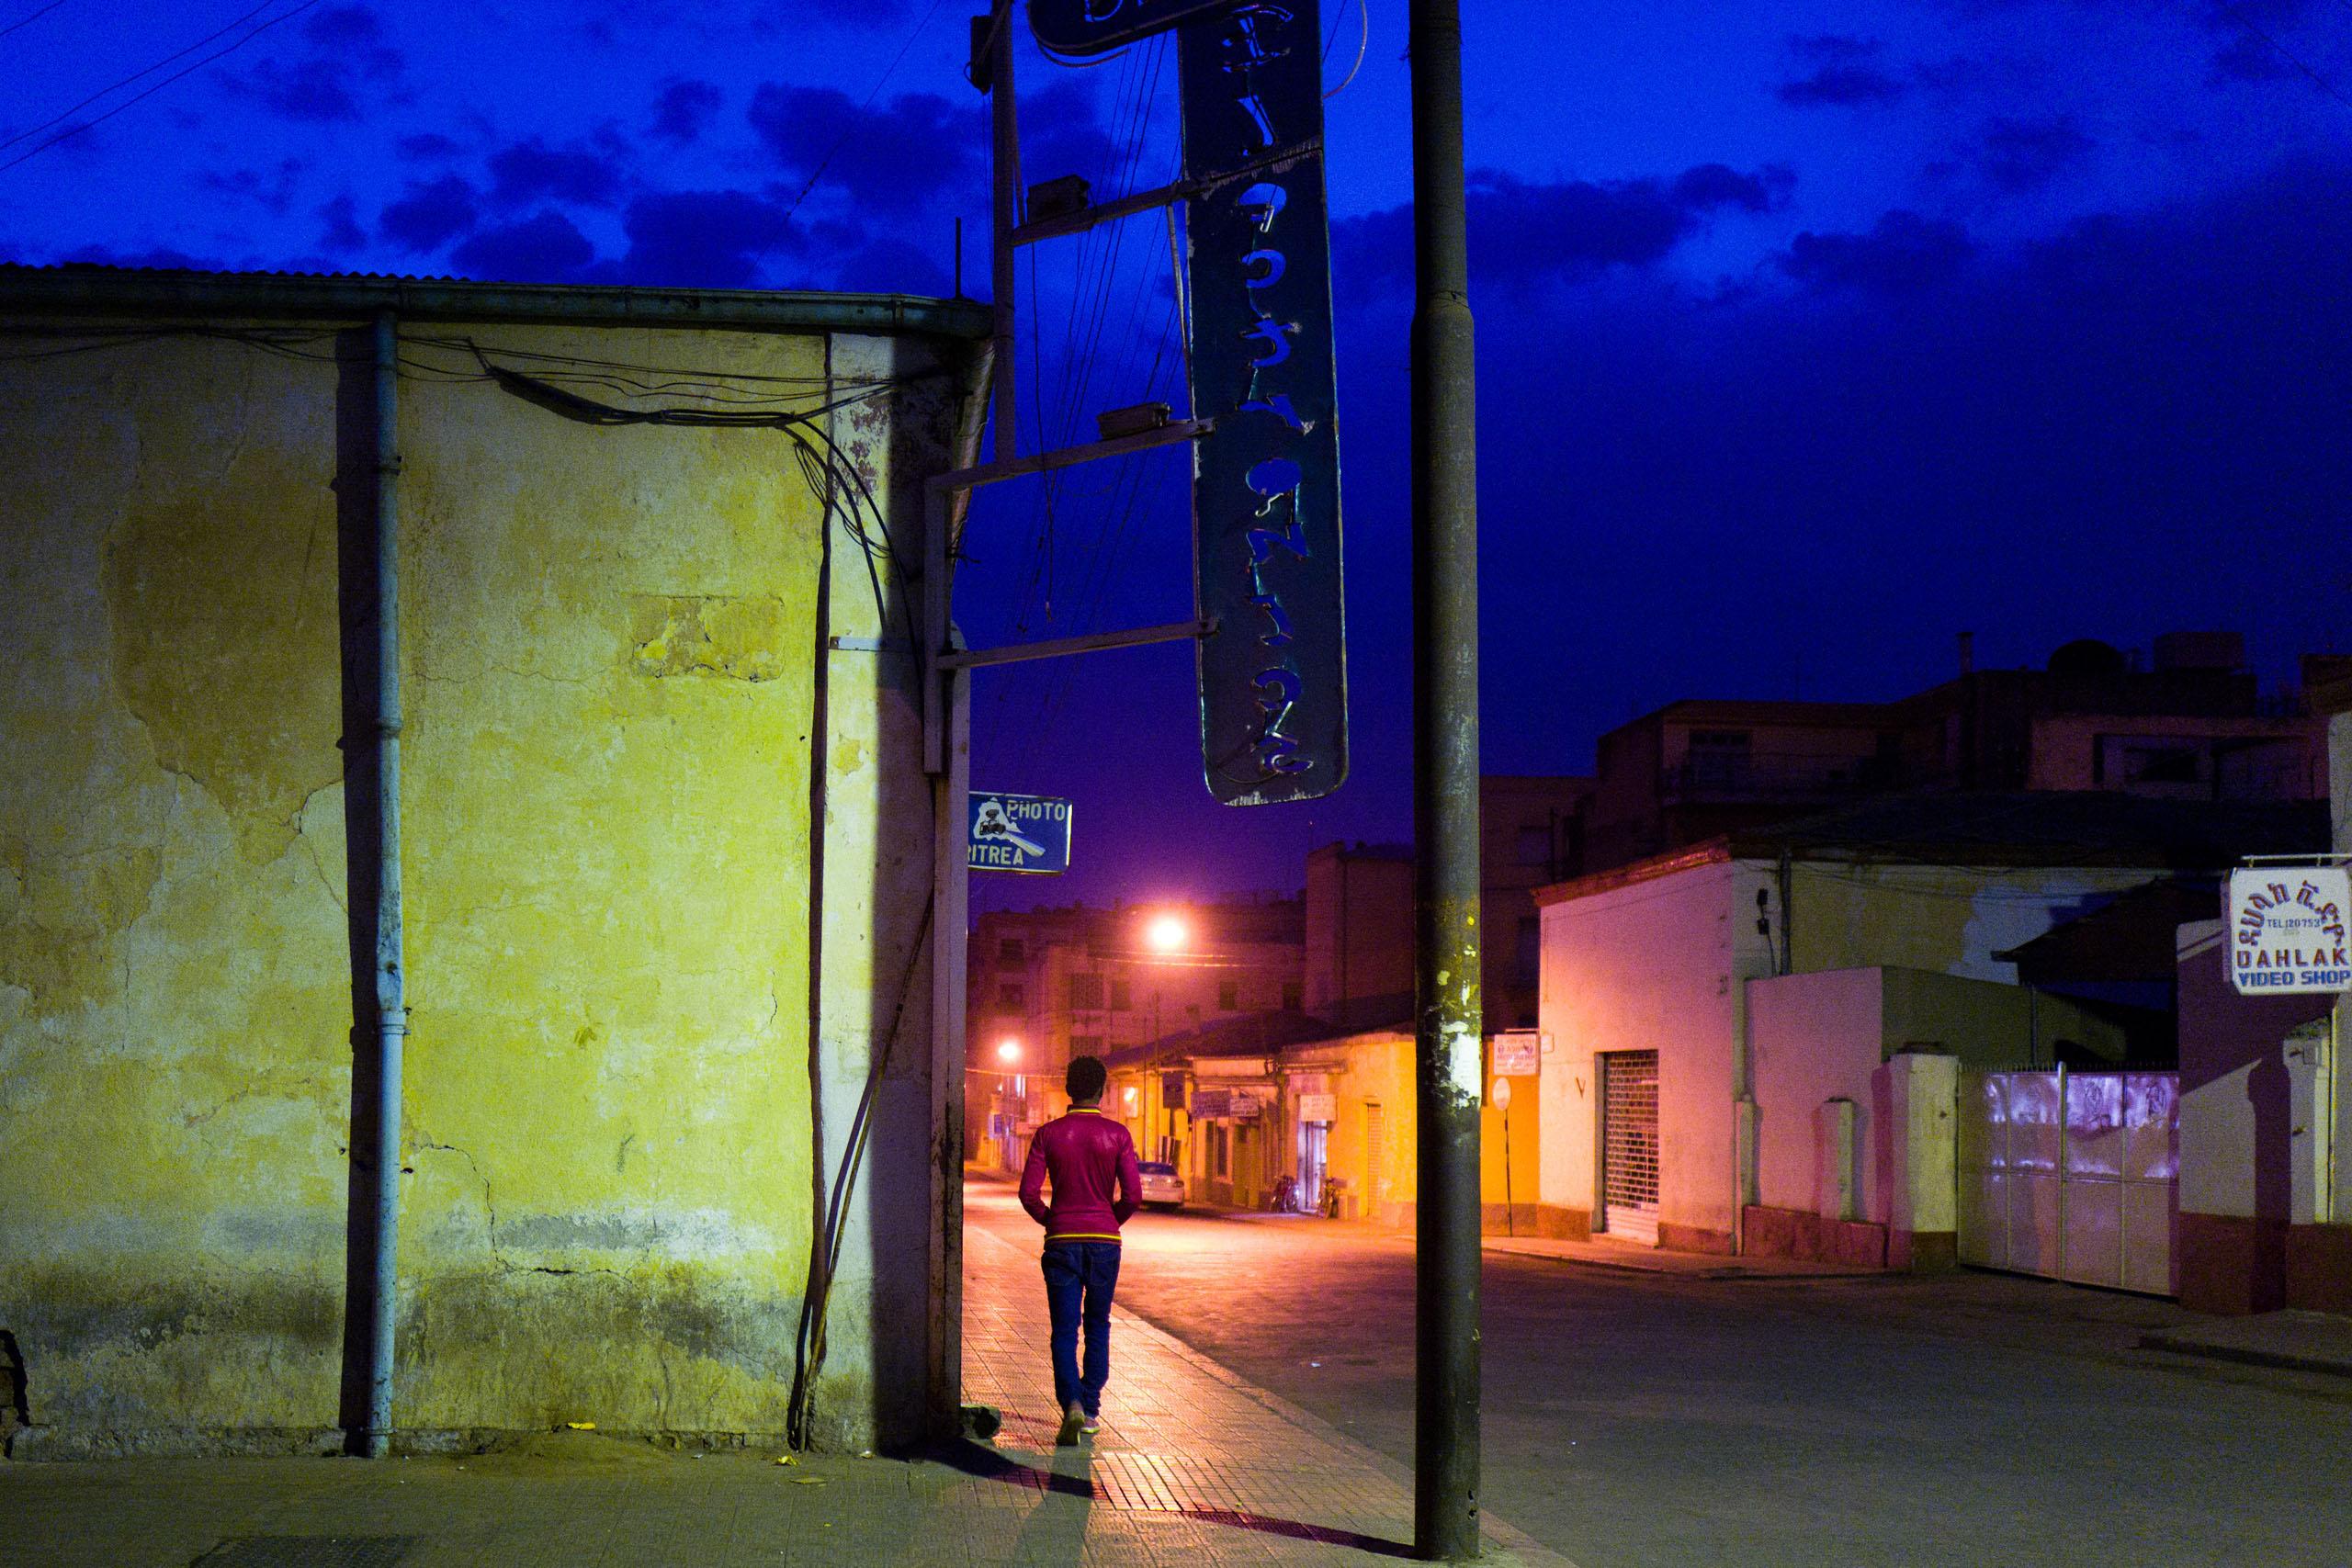 On the street at night in Asmara.